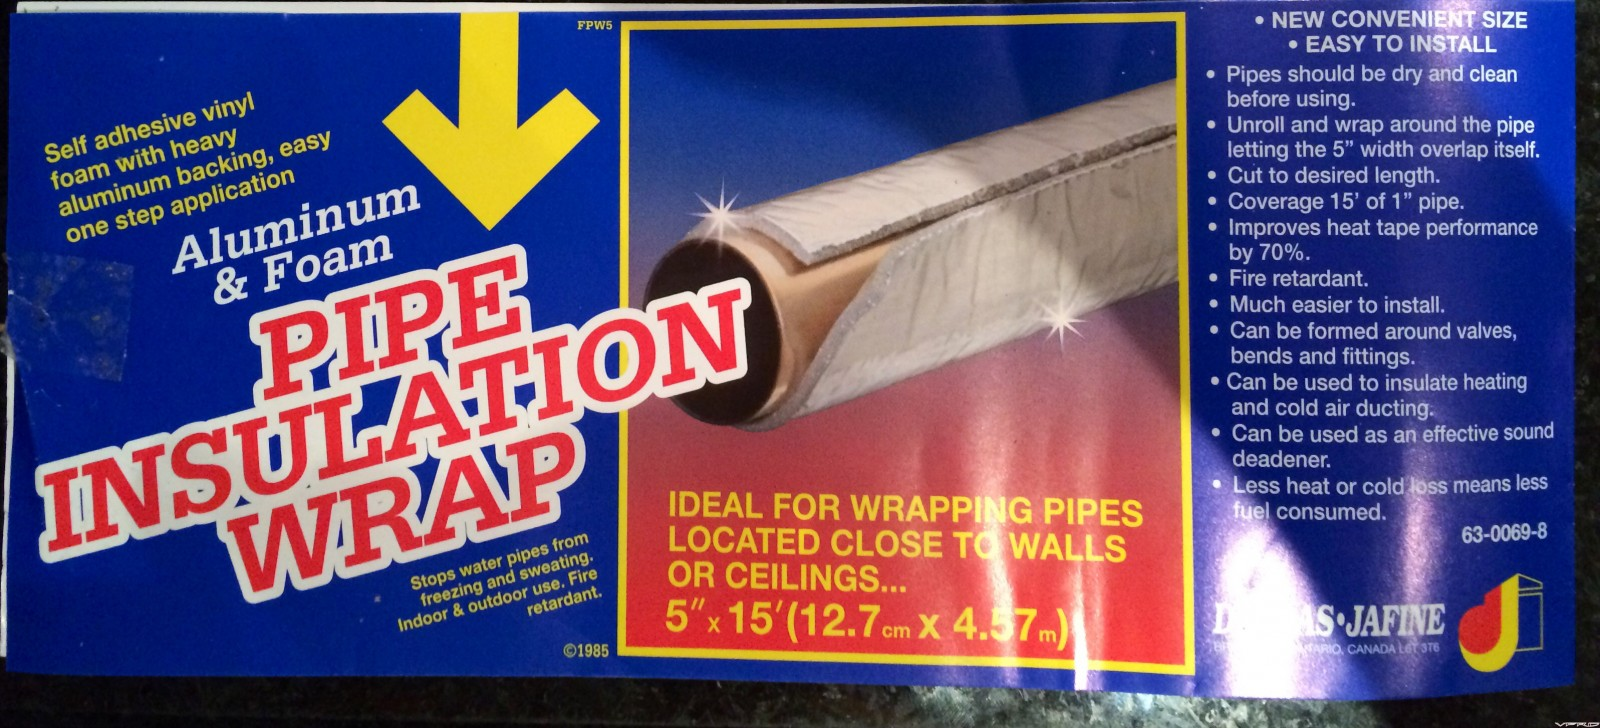 Vinyl foam aluminum backed self-stick insulation